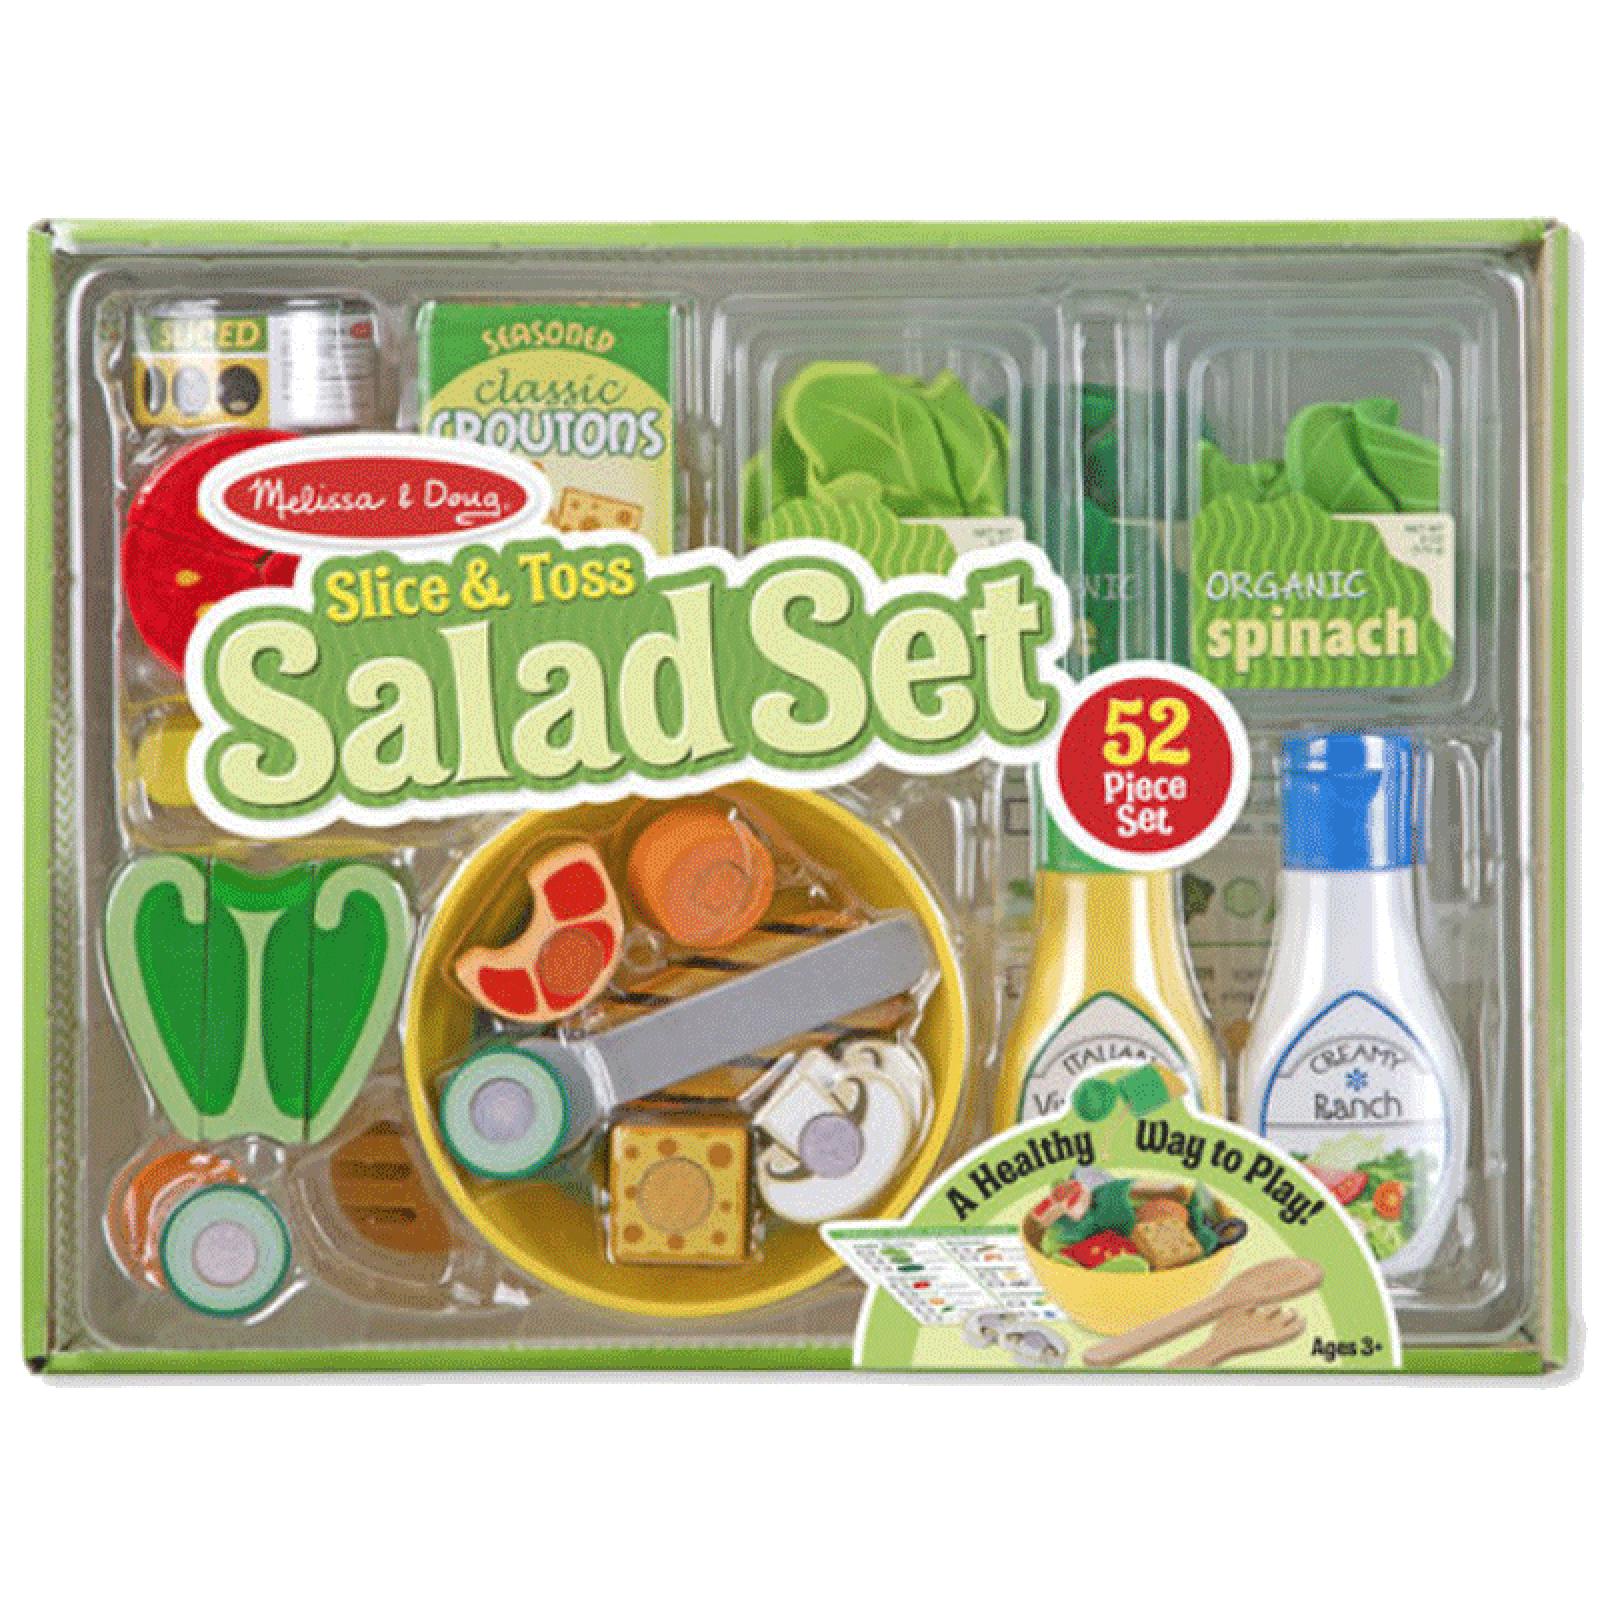 Salad Set Slice And Toss Melissa & Doug